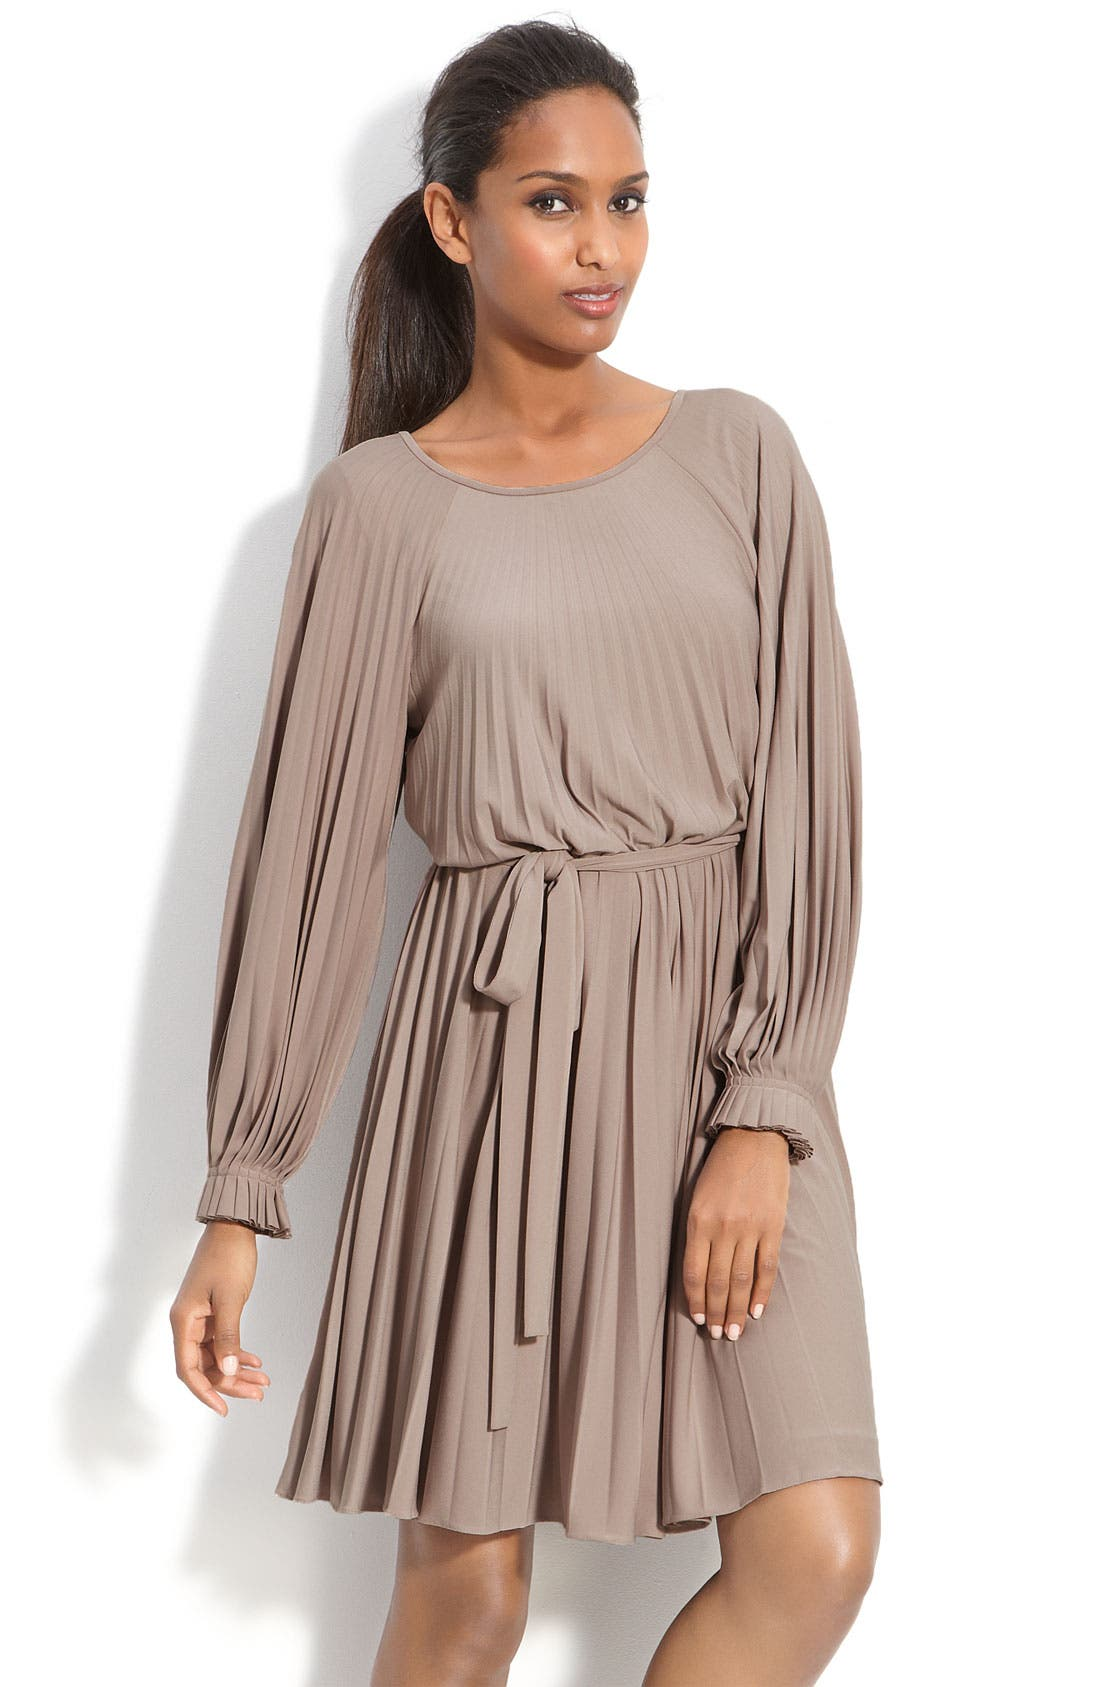 Alternate Image 1 Selected - Donna Morgan Sunburst Pleat Jersey Dress